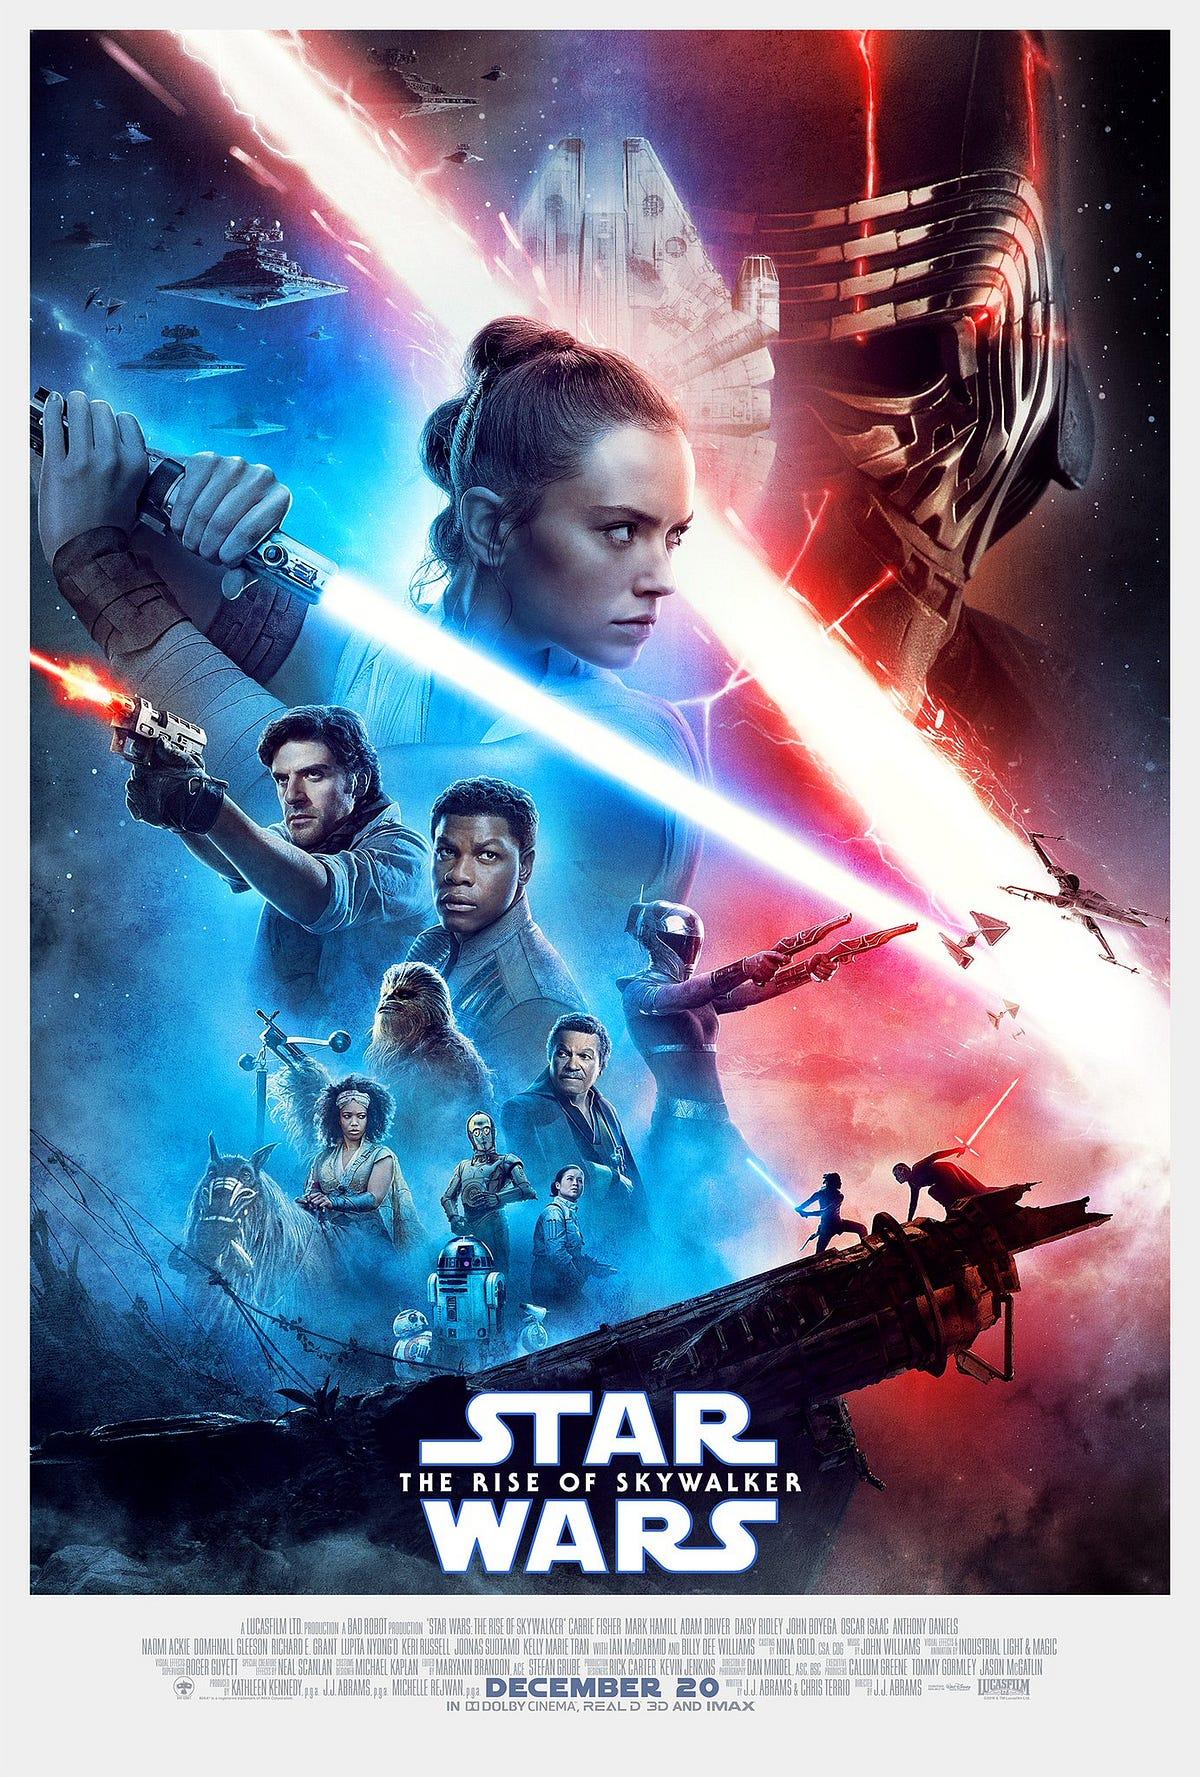 Star Wars 2 L'attaque Des Clones Film Complet En Francais : l'attaque, clones, complet, francais, FILM@Complet, Wars:, L'ascension, Skywalker, Streaming~, ReGARder, Français, Getaah, Medium